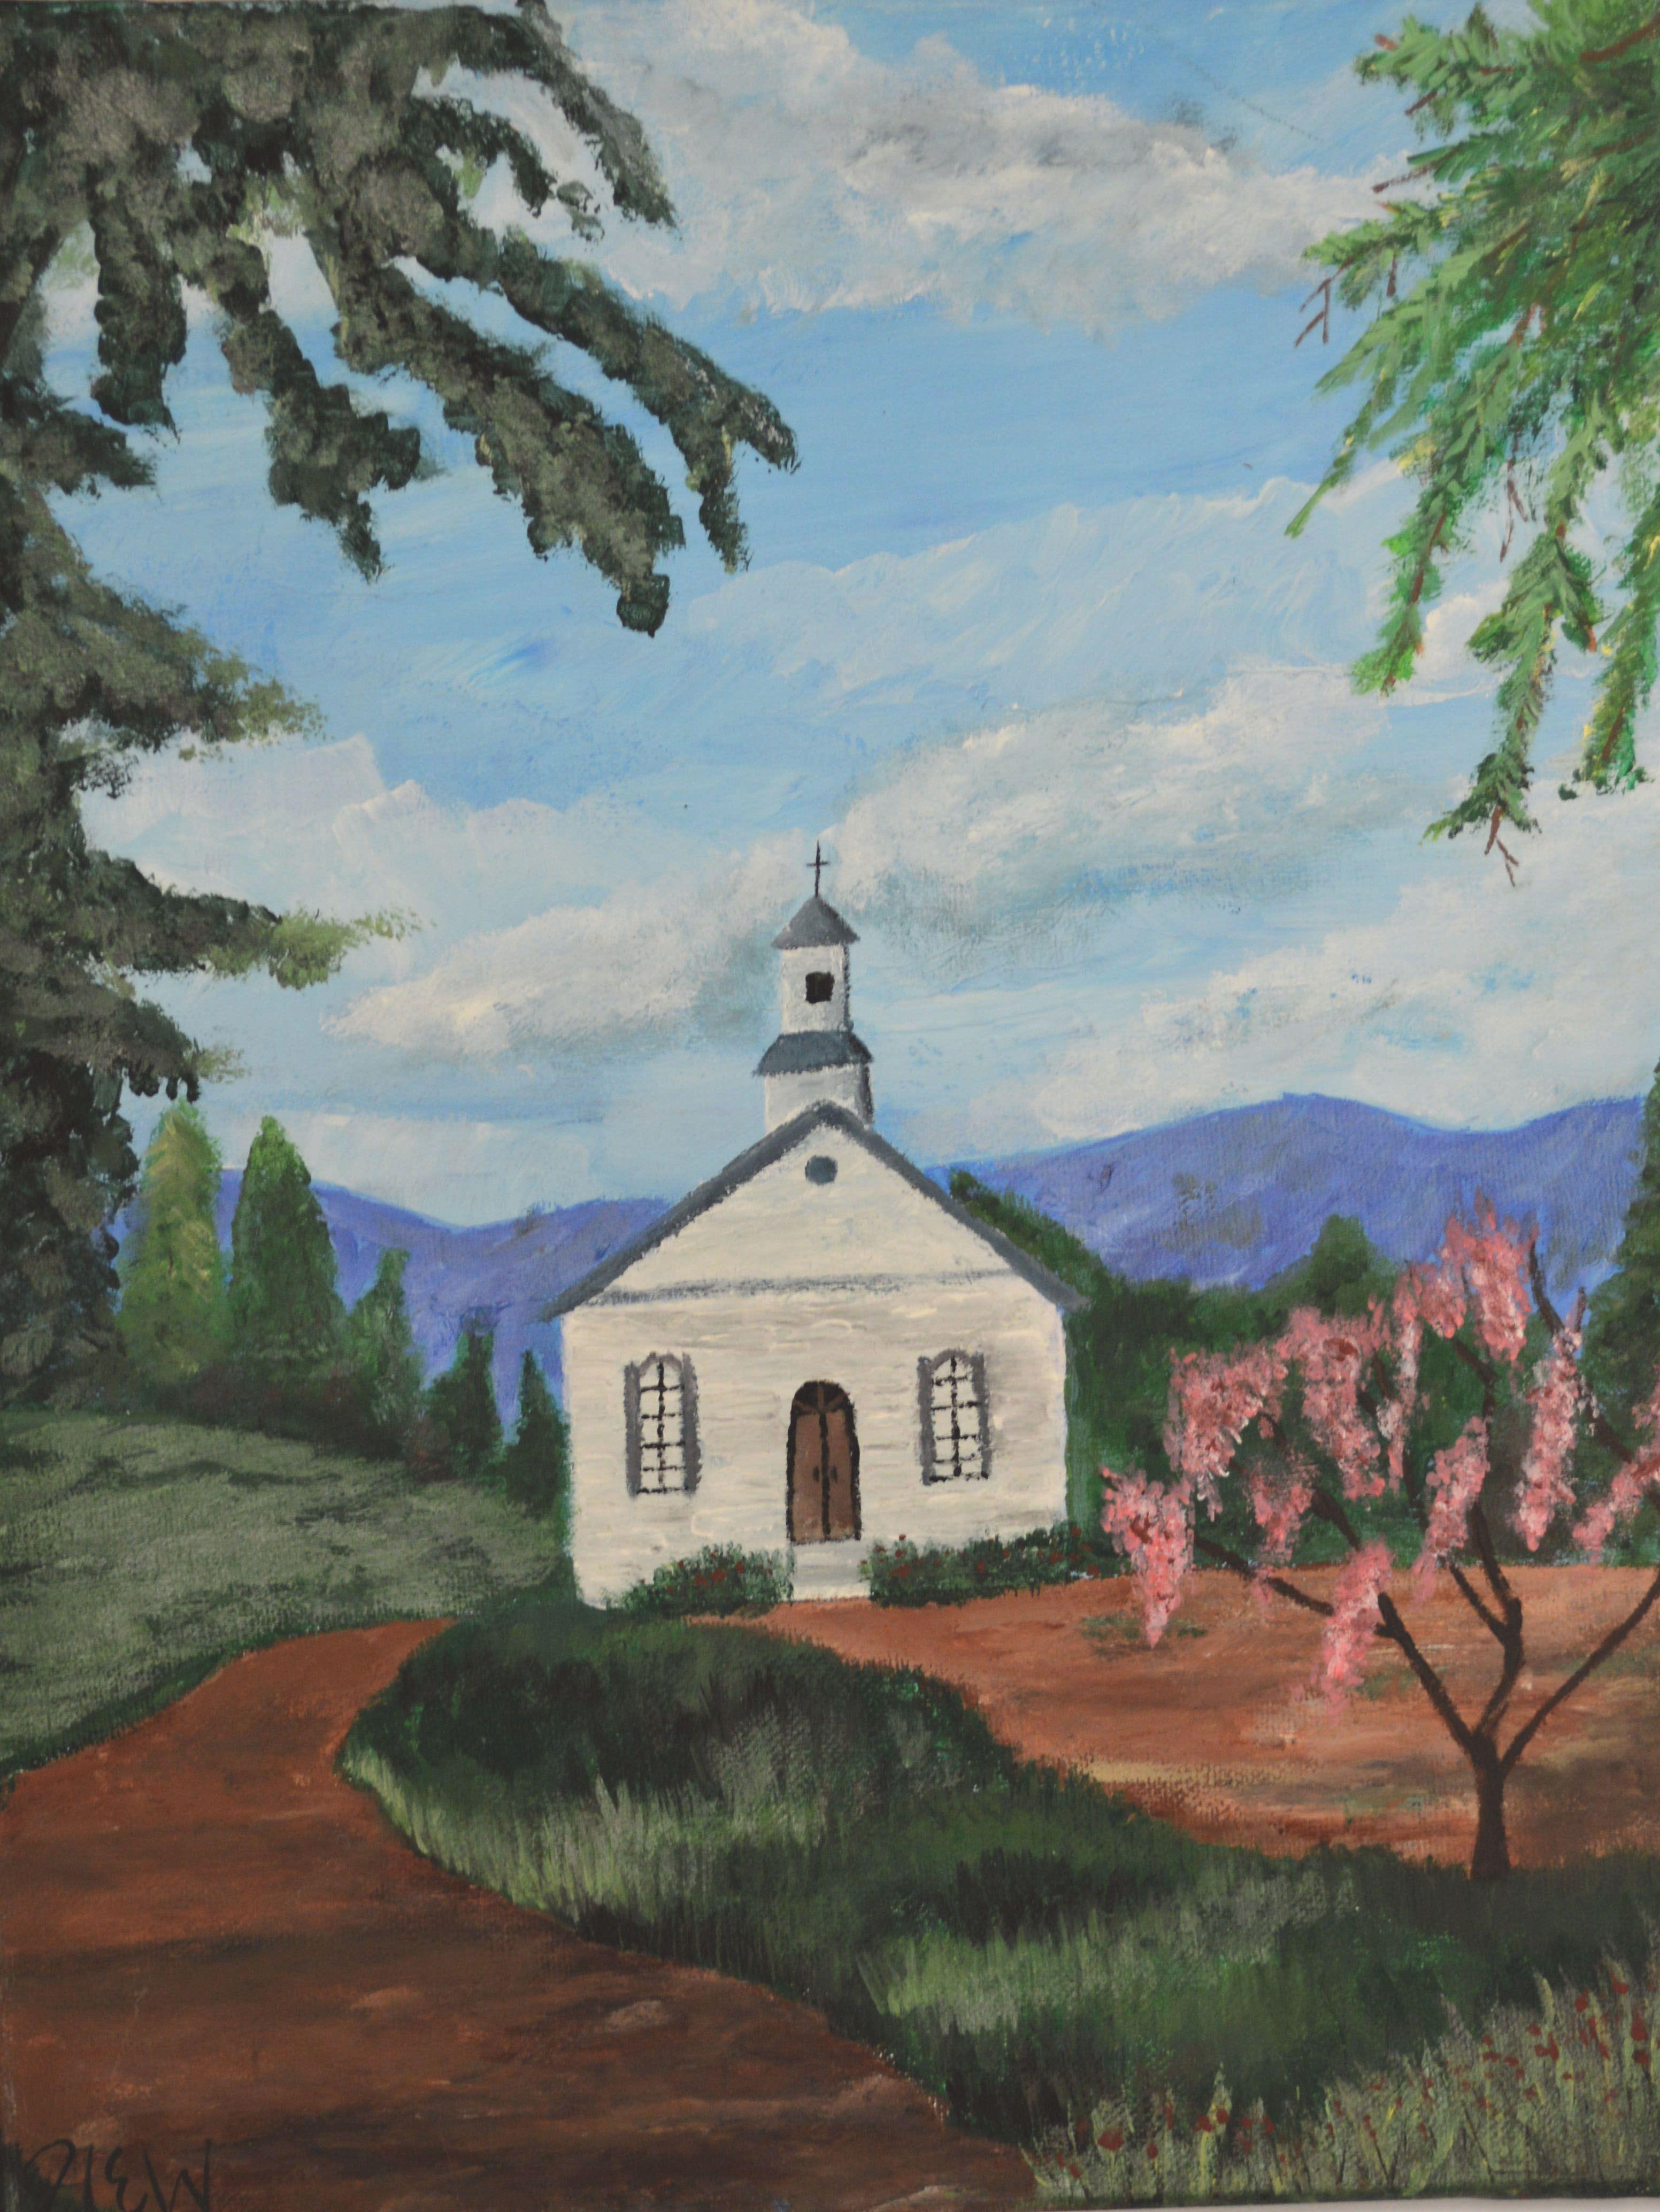 Arylic Church Landscape Painting By Hannah Wilson Landscape Paintings Painting Landscape